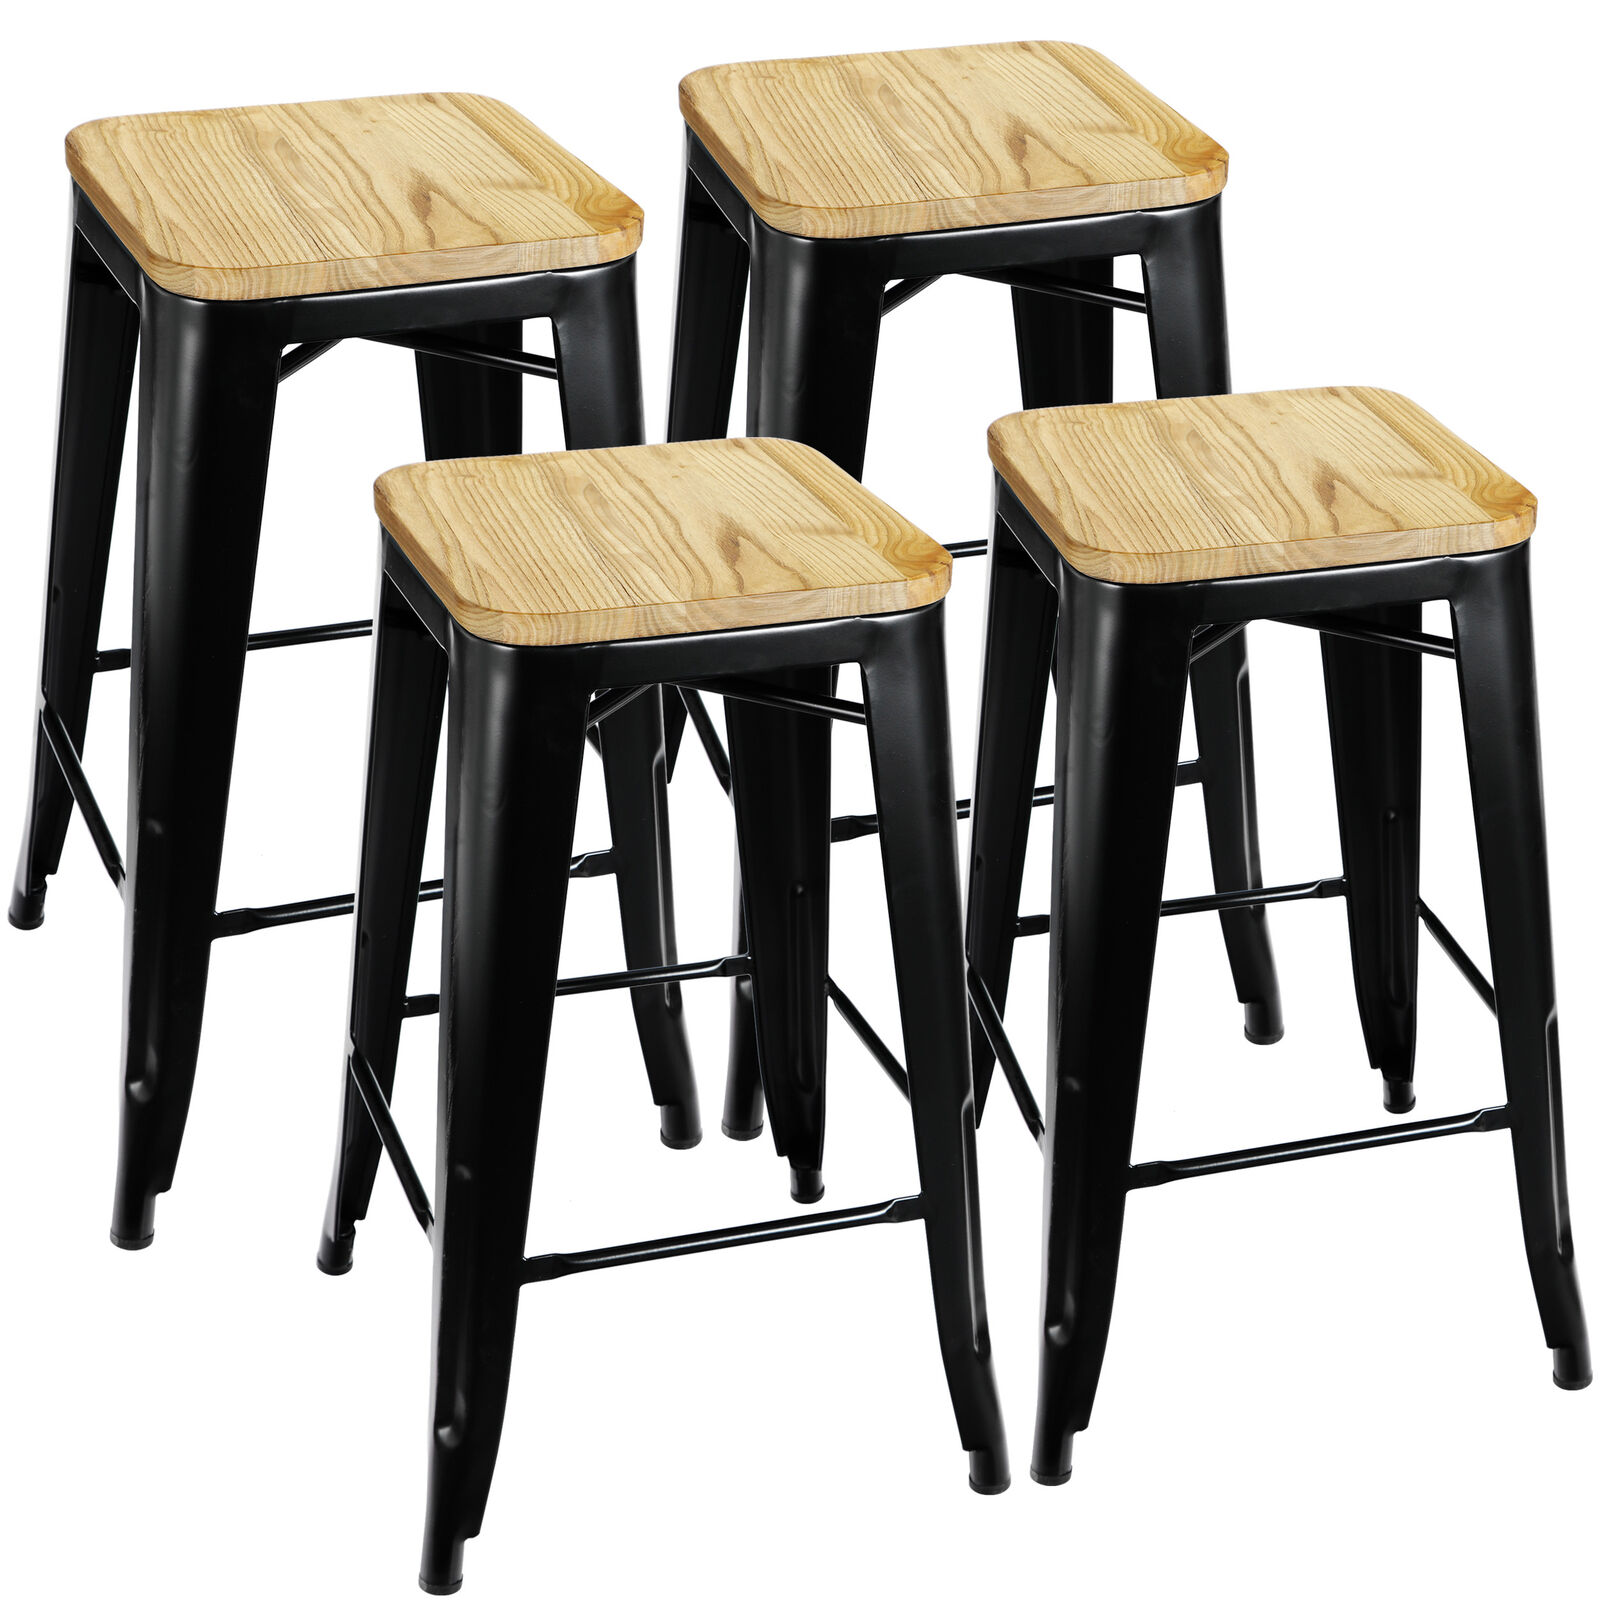 26″ barstools Set of 4 Counter Height Metal Bar Stools Indoor Outdoor  Black Benches, Stools & Bar Stools